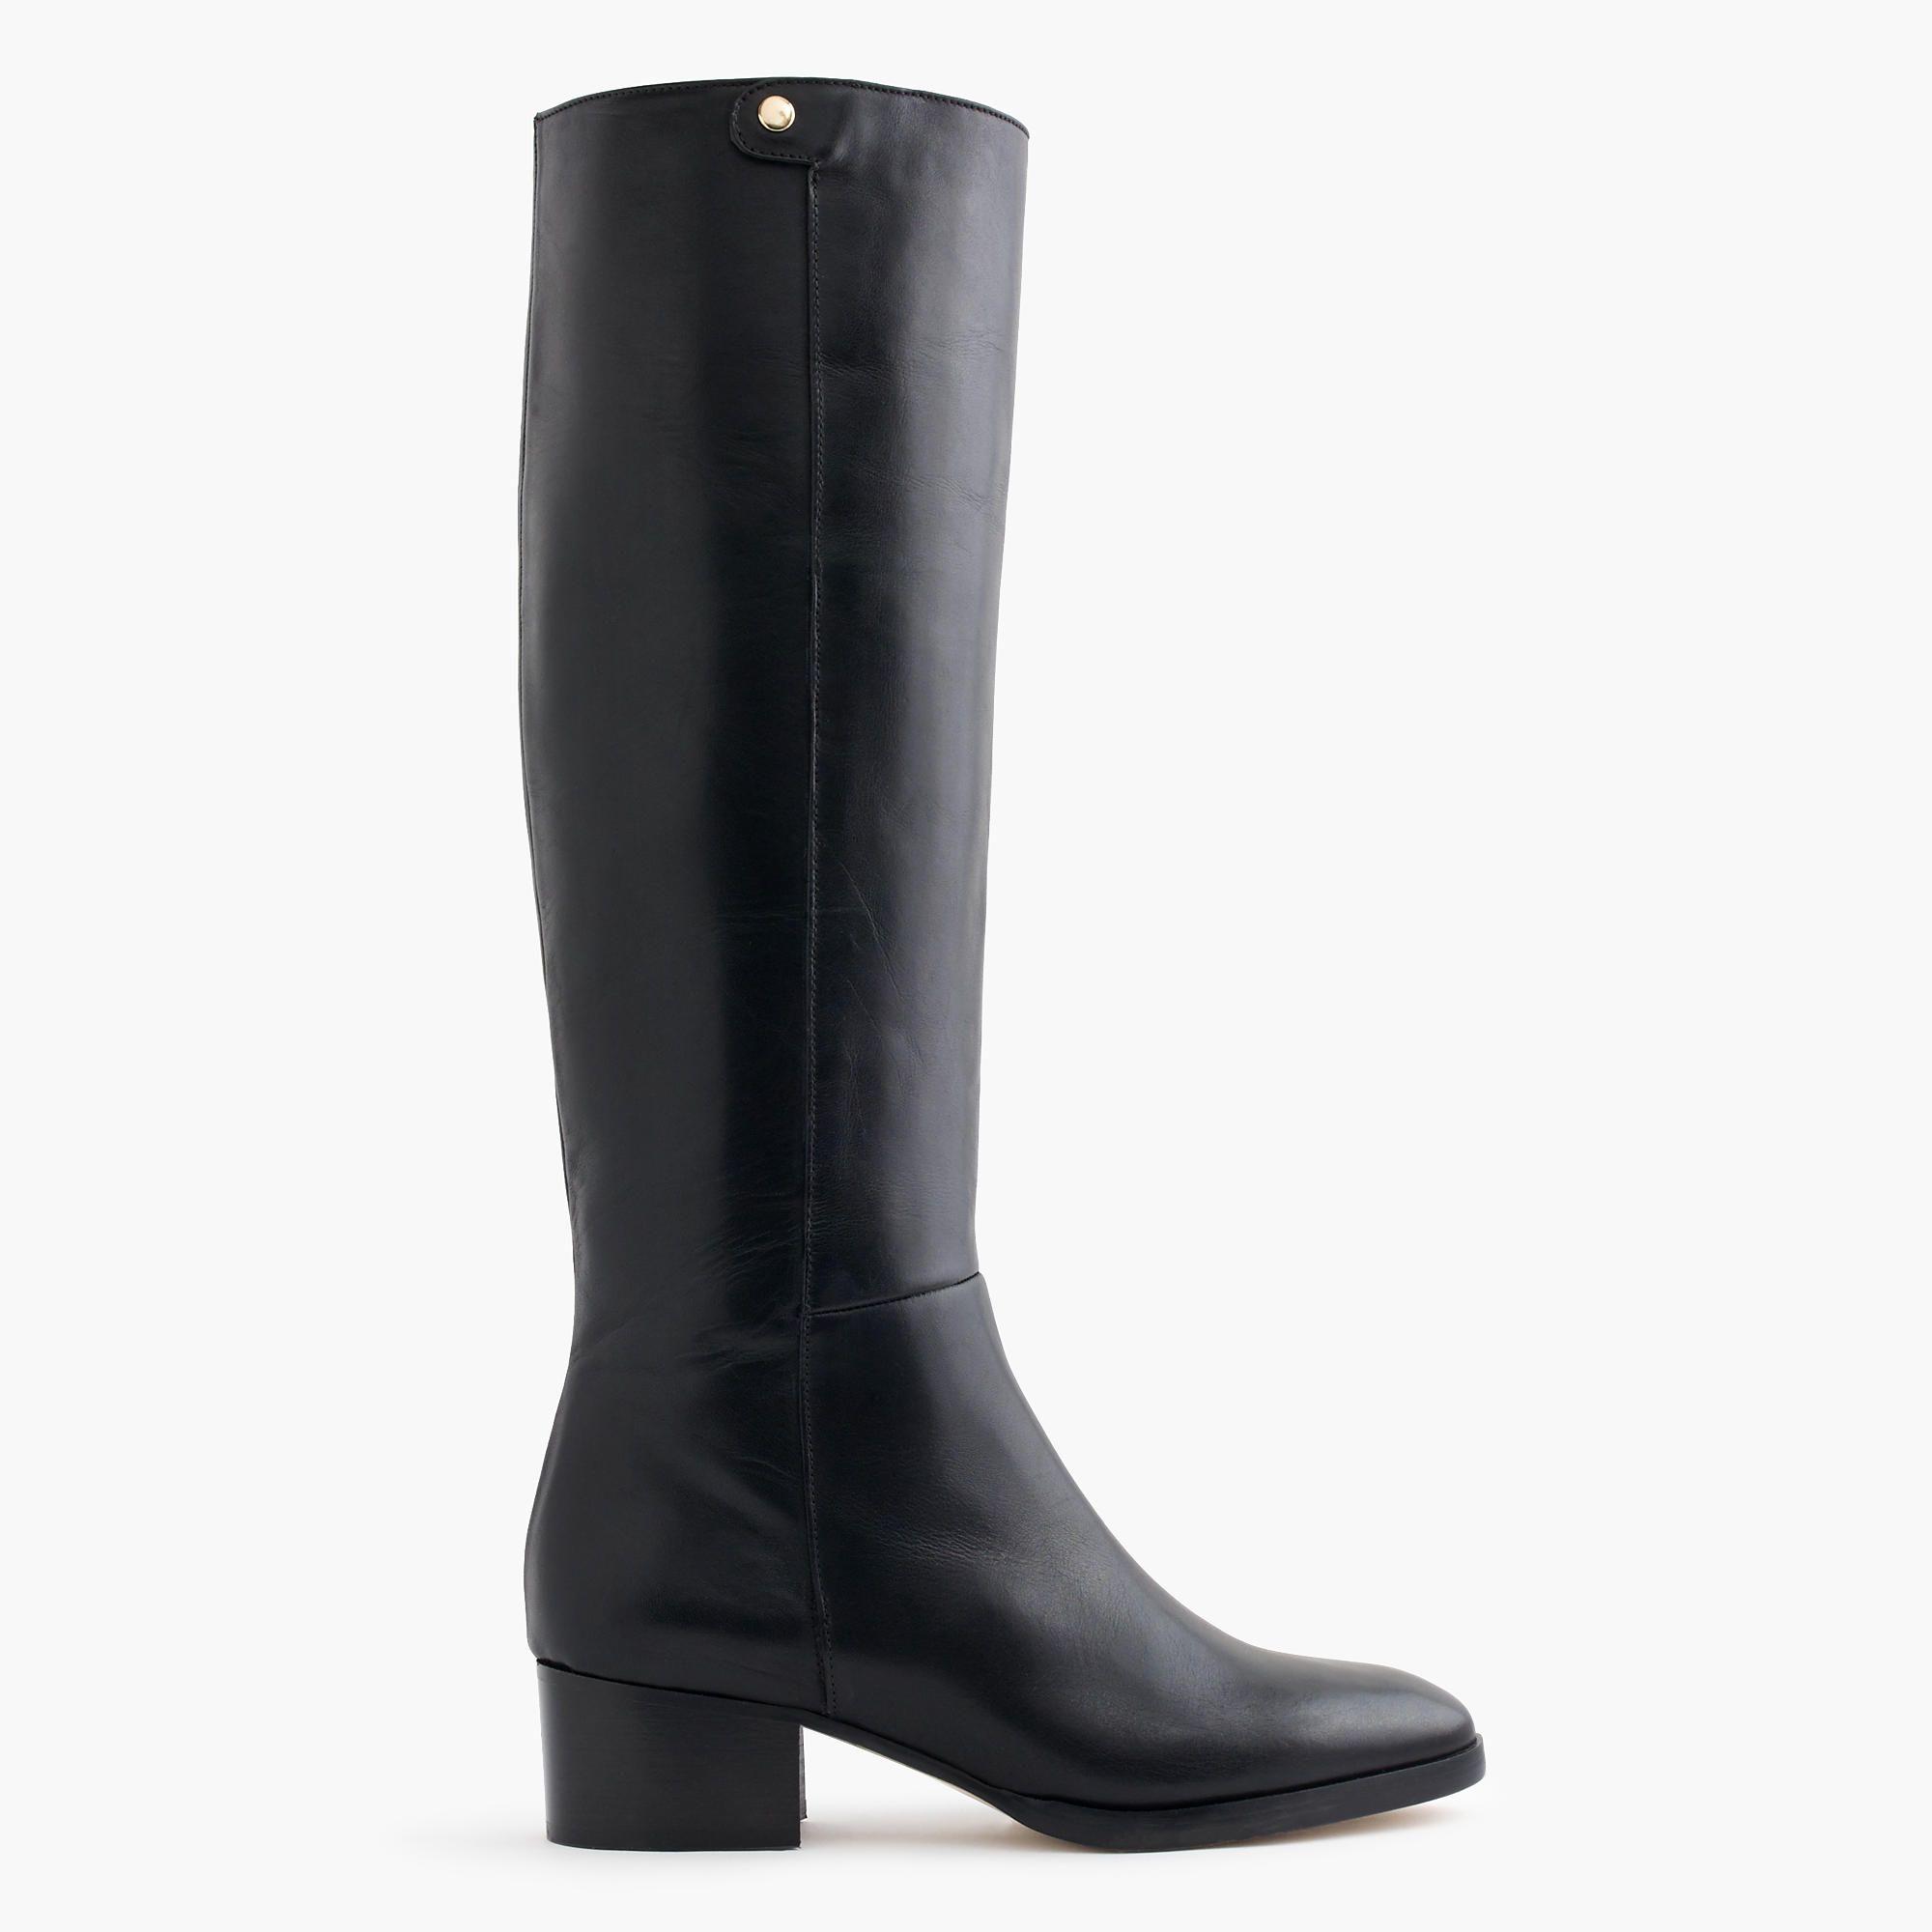 J.Crew - Leather knee boots